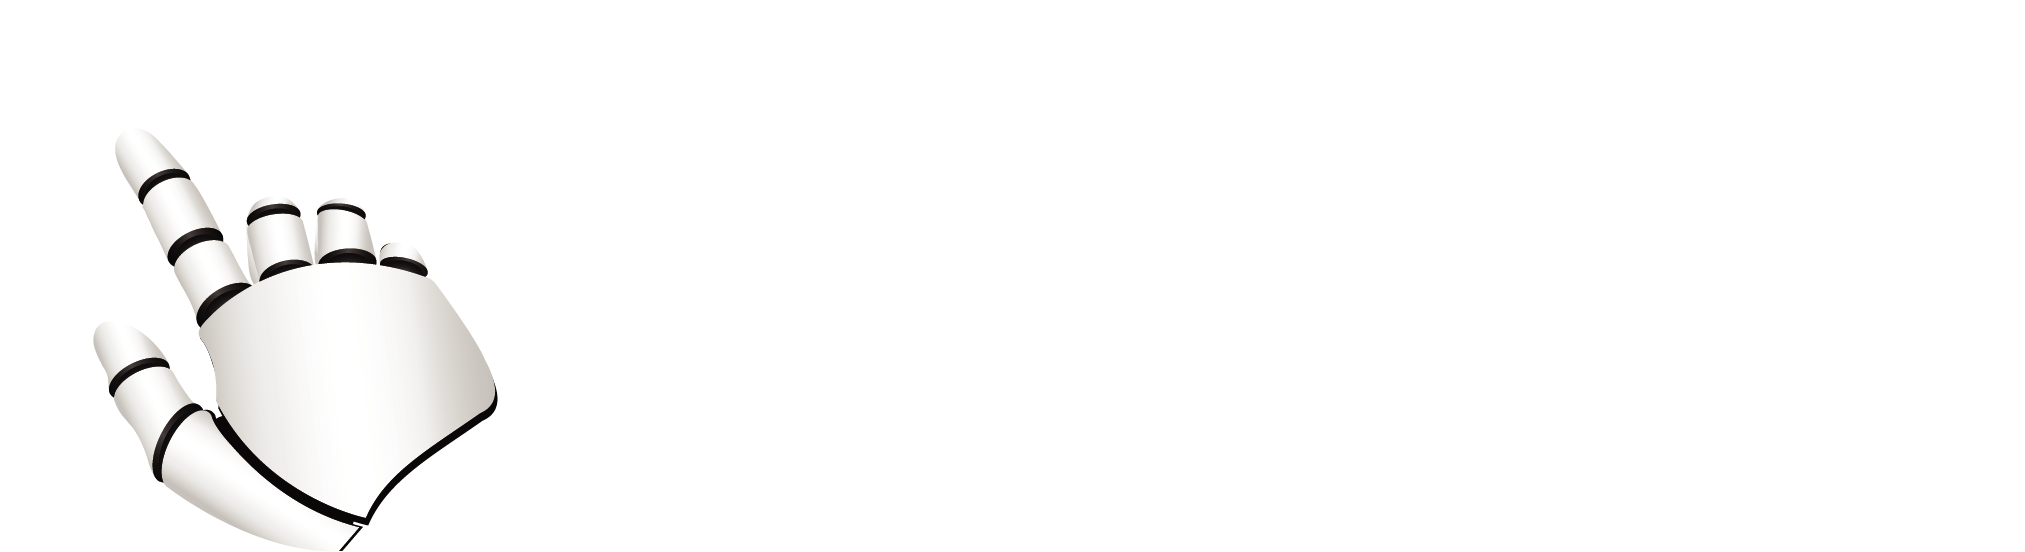 Intelligence Automation Week December